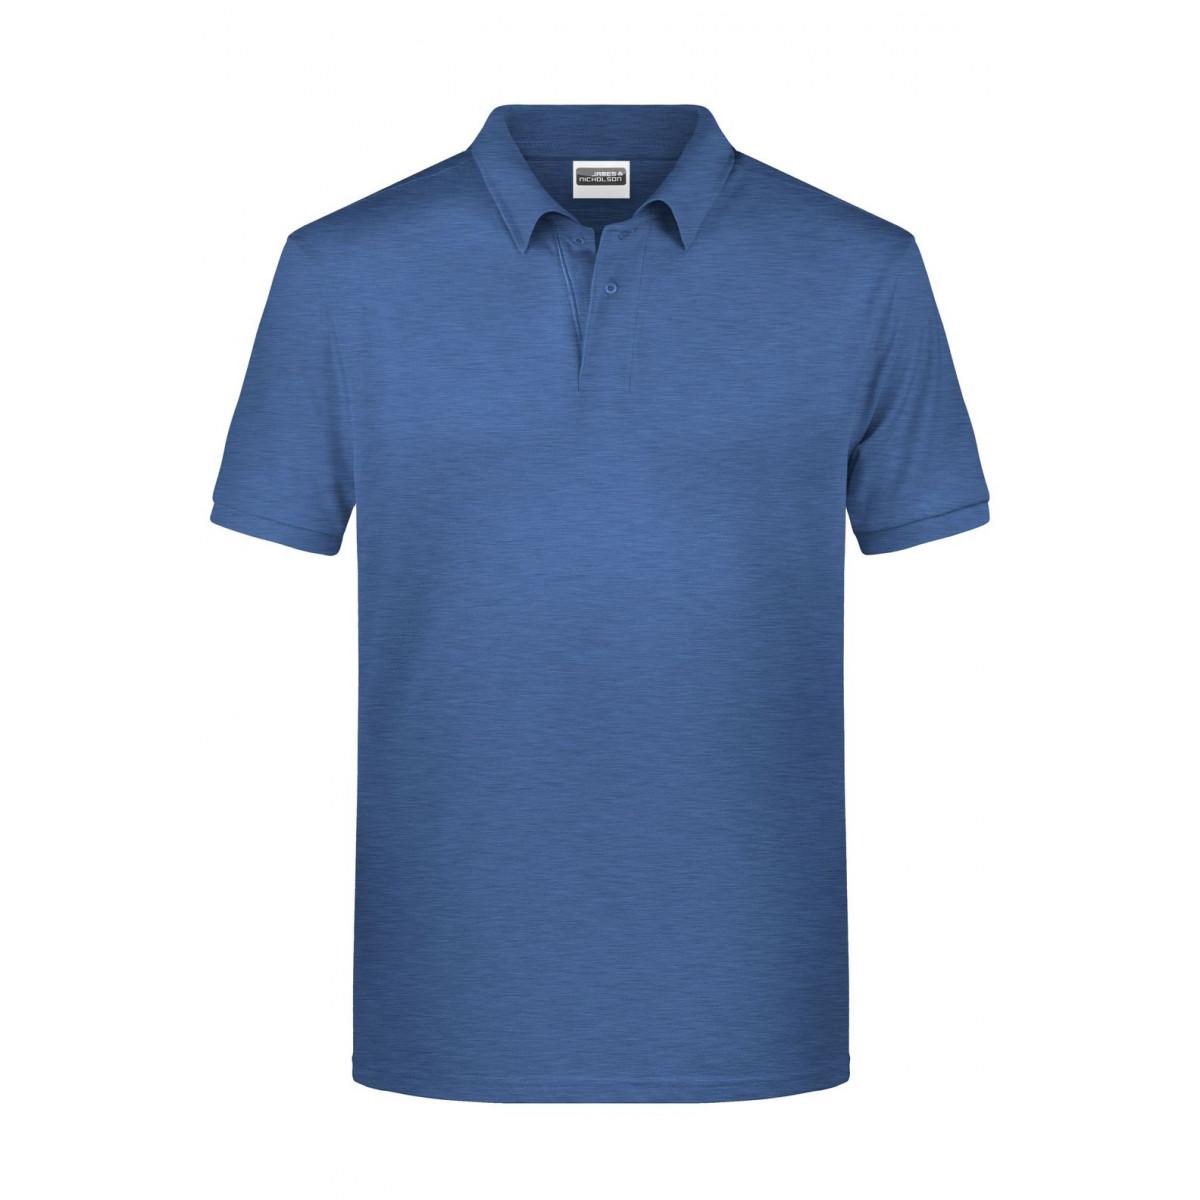 Рубашка поло мужская 8010 Mens Basic Polo - Светло-синий меланж